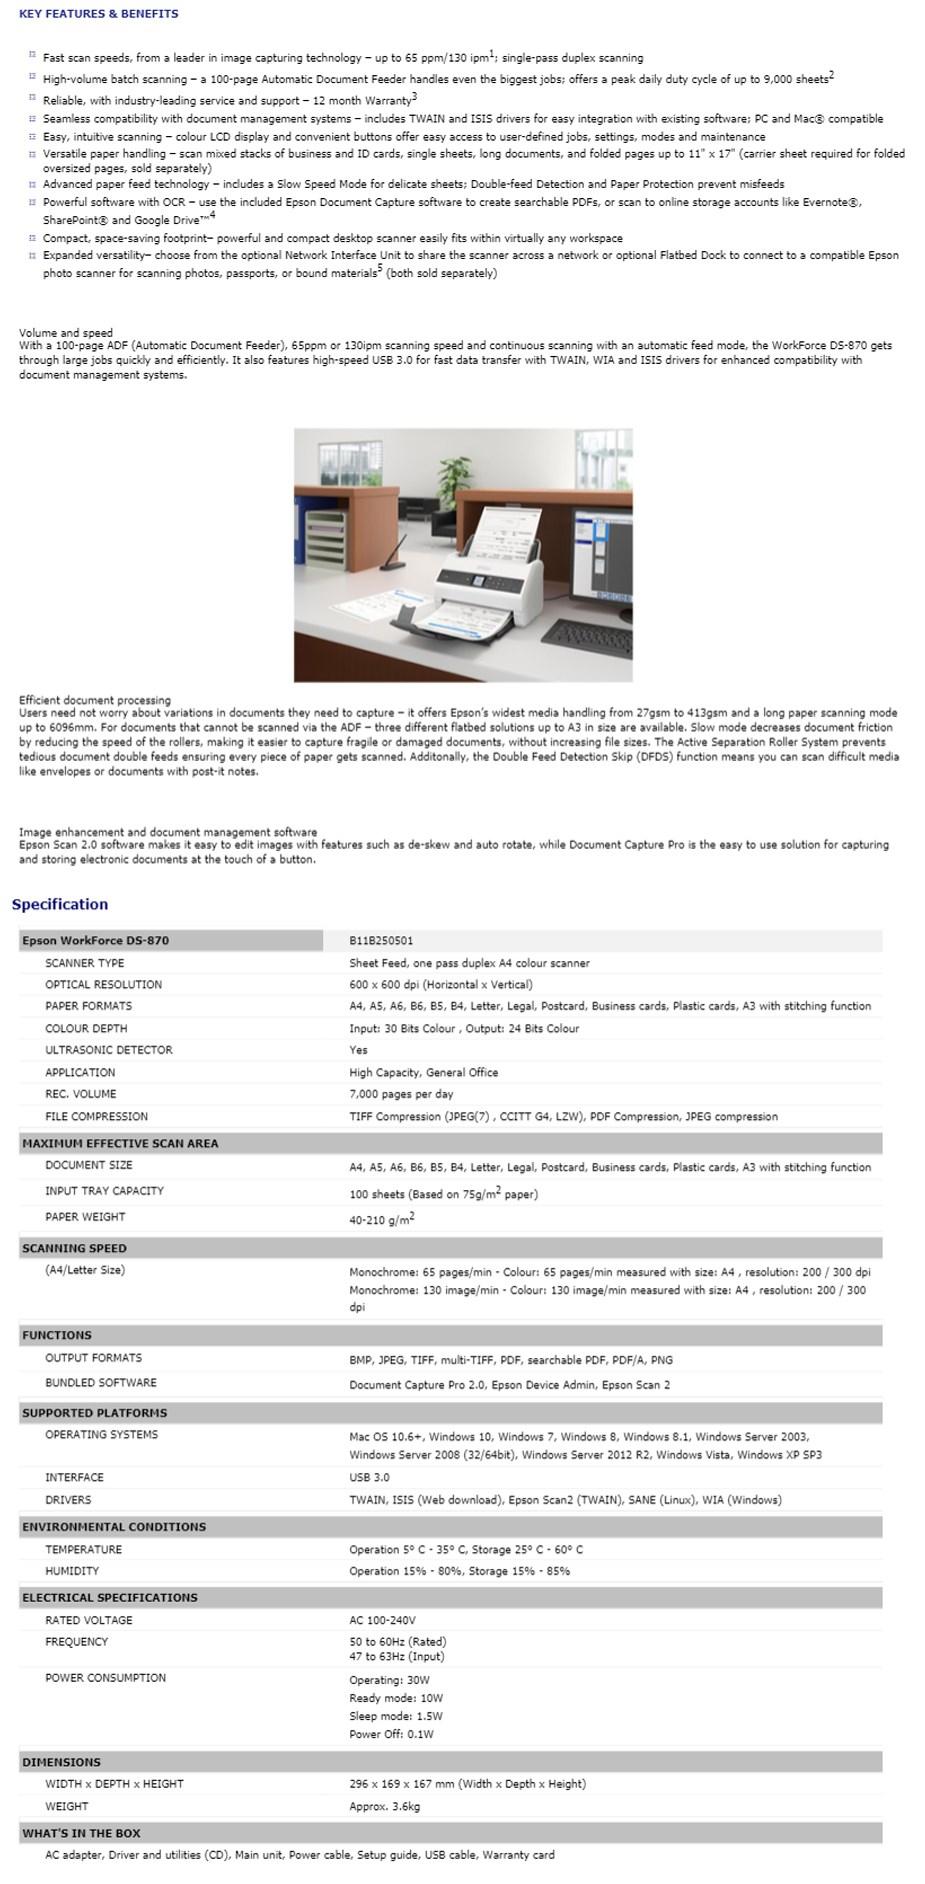 Epson WorkForce DS-870 Document Scanner - Overview 1